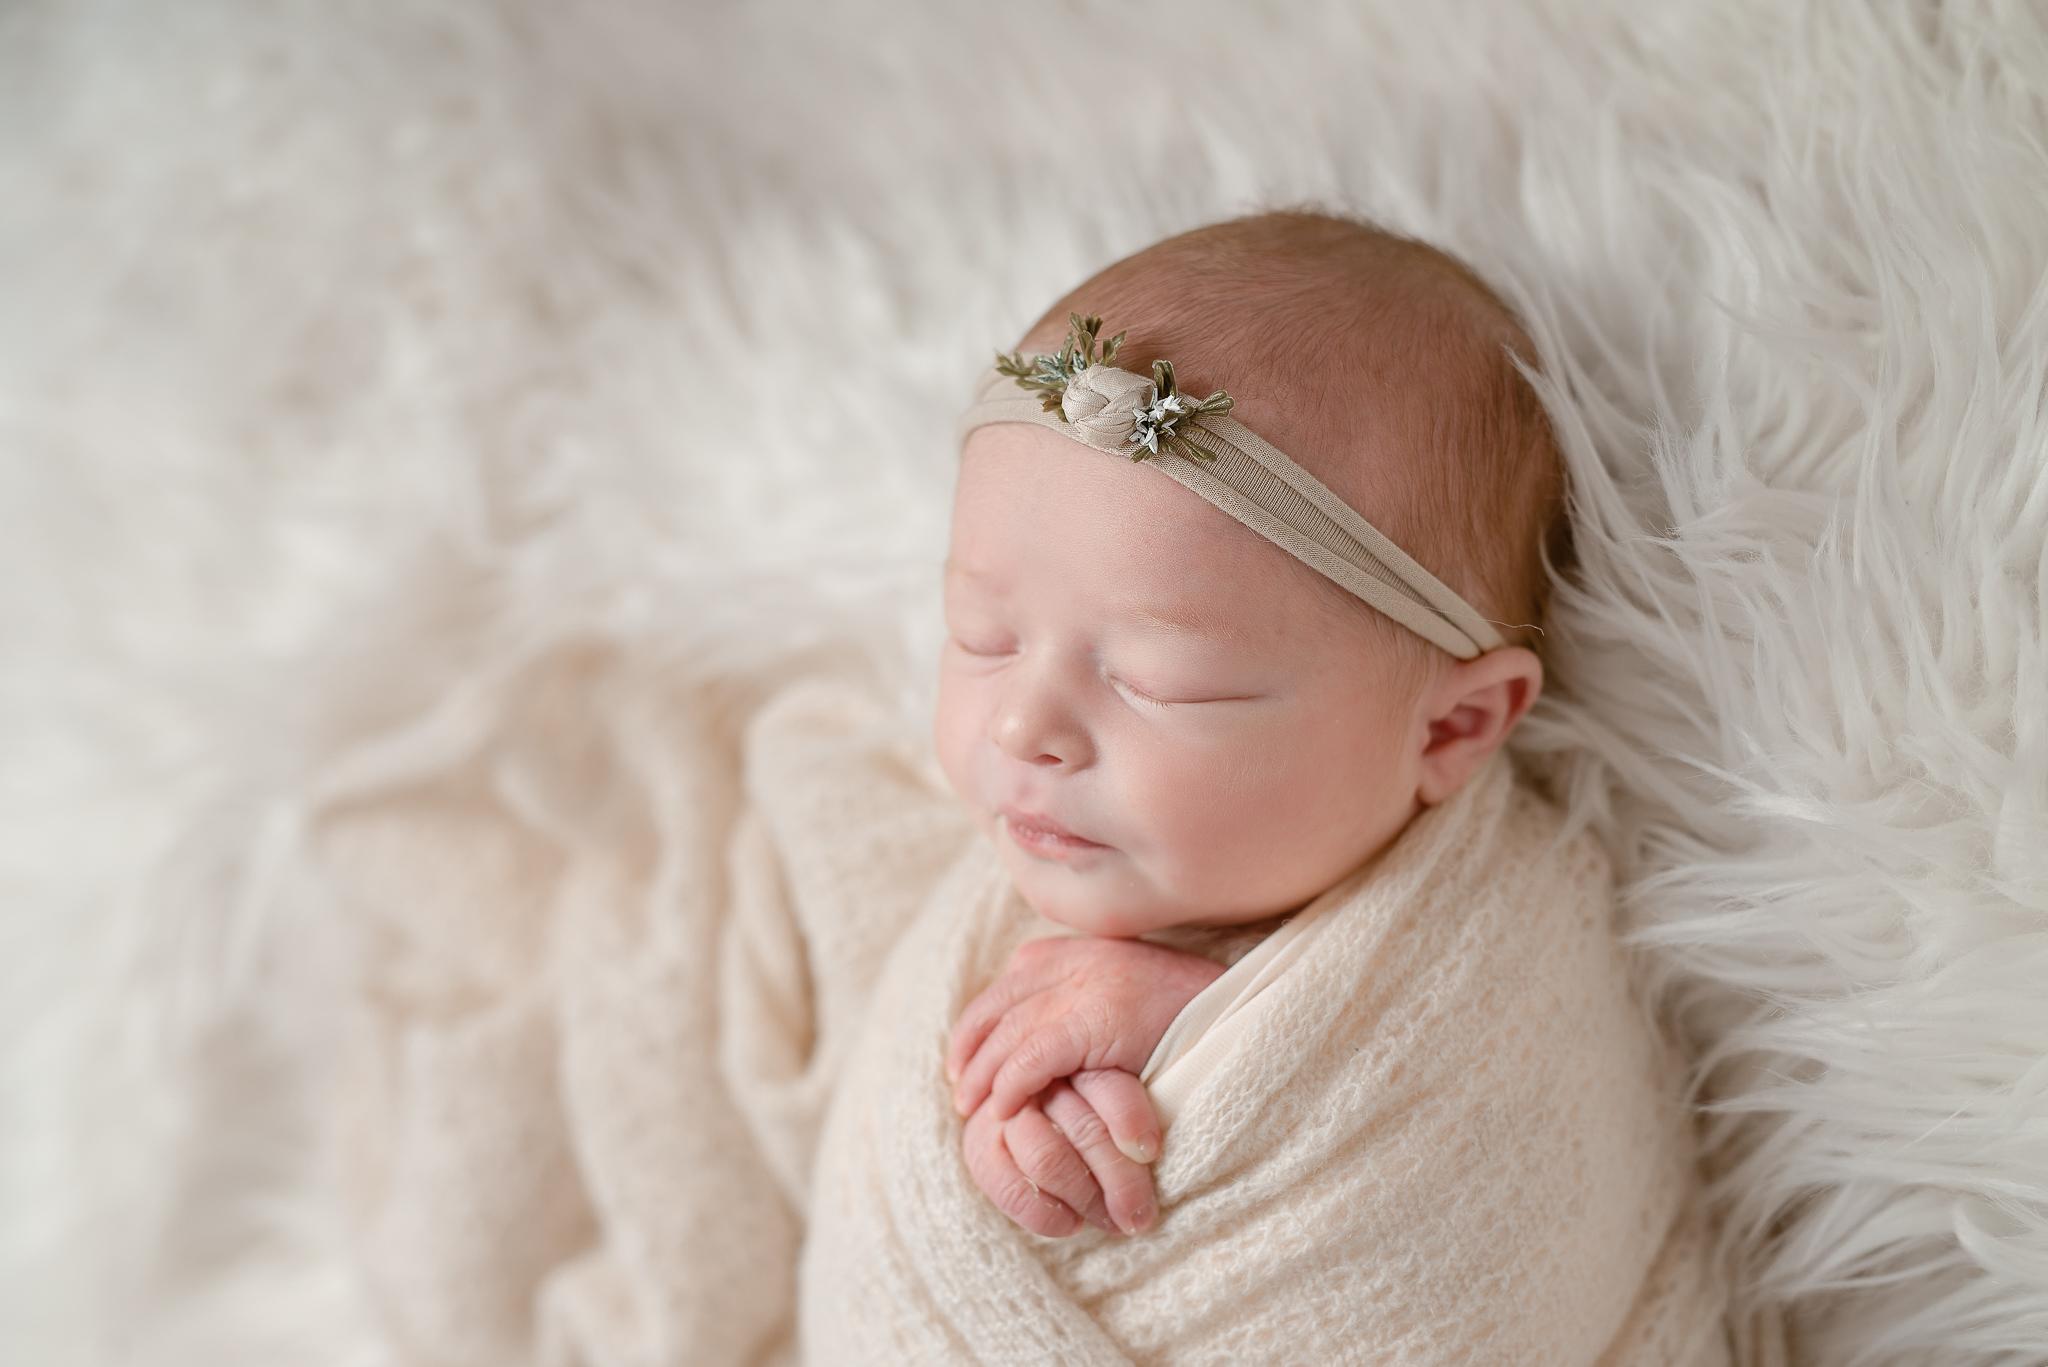 Newborn102NaomiLuciennePhotography032019-Edit.jpg